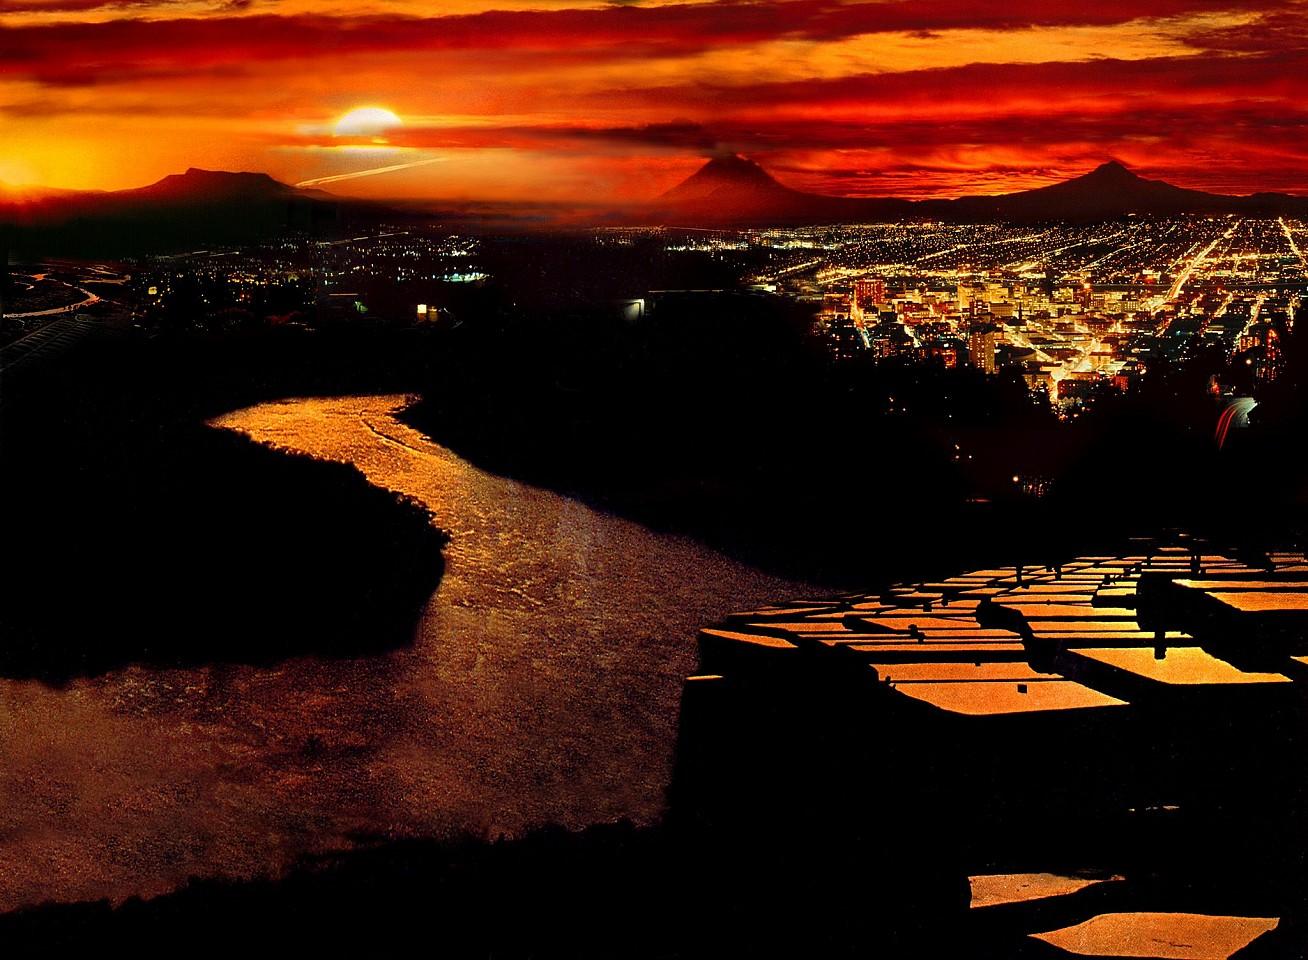 Oliver Wasow, Kusiro River, Hokkaido, Japan 1997, Archival inkjet